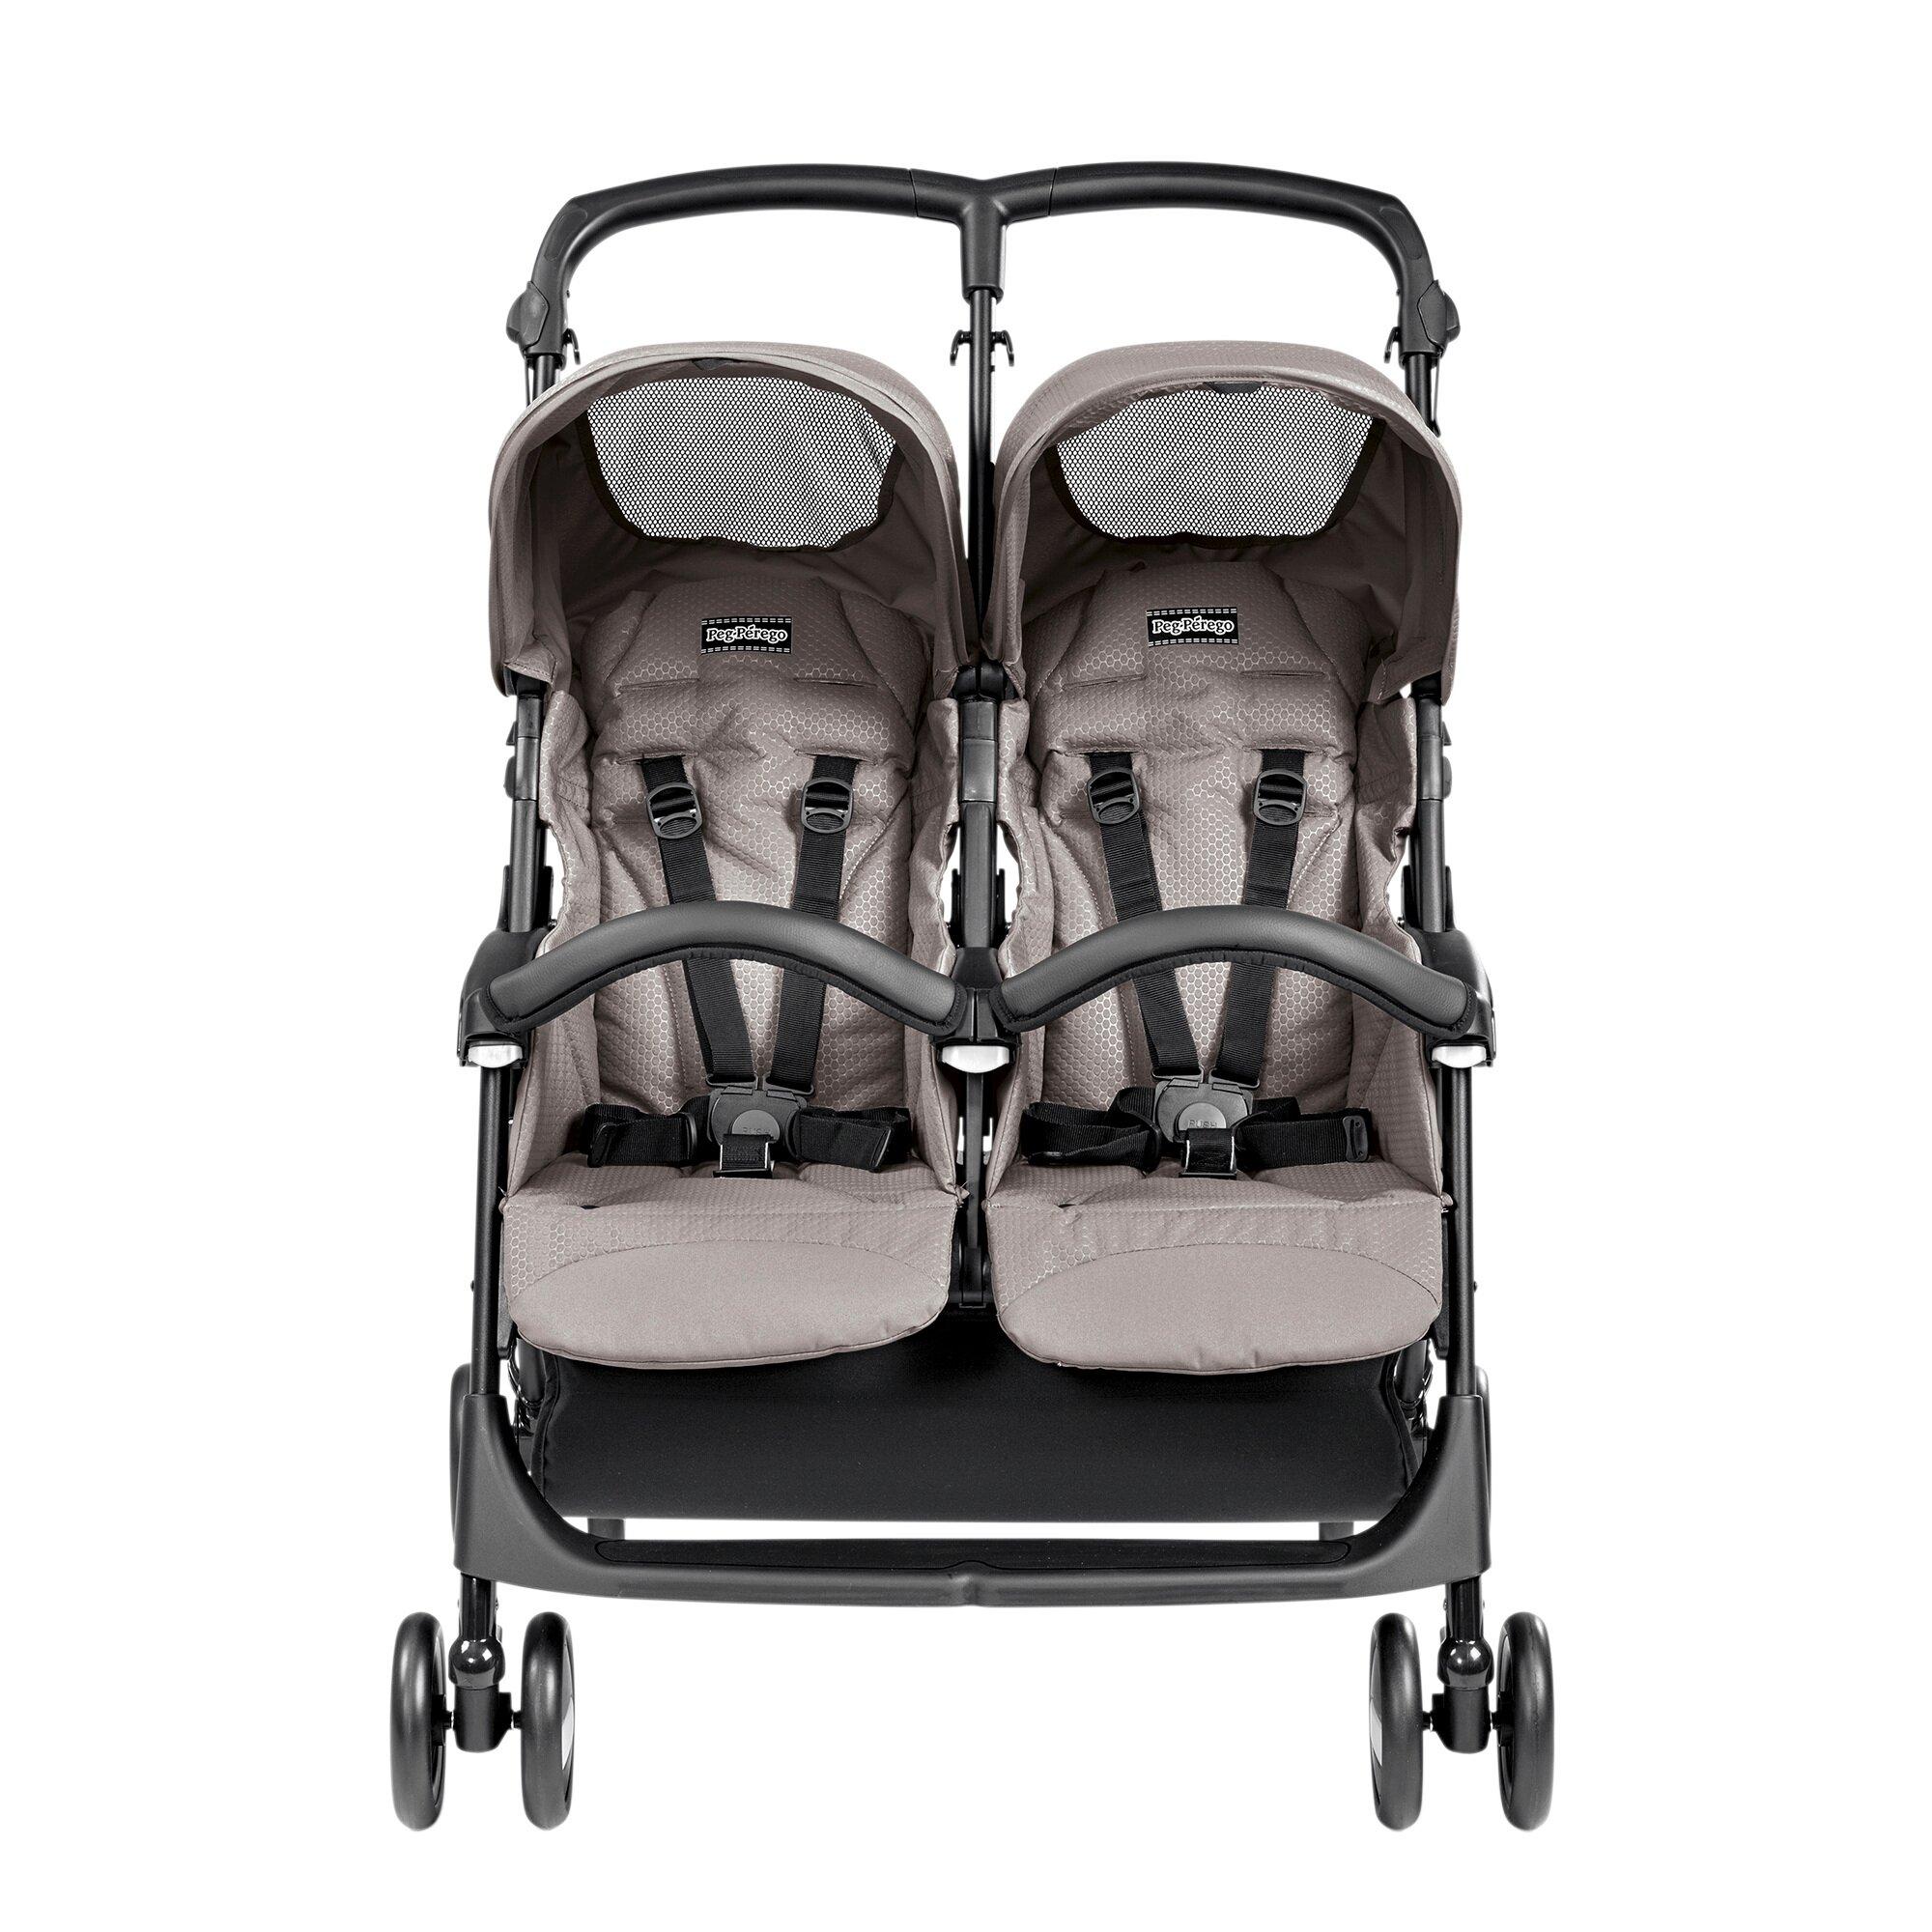 peg-perego-aria-shopper-twin-kinderwagen-zwillingswagen-design-2016-beige, 311.99 EUR @ babywalz-de